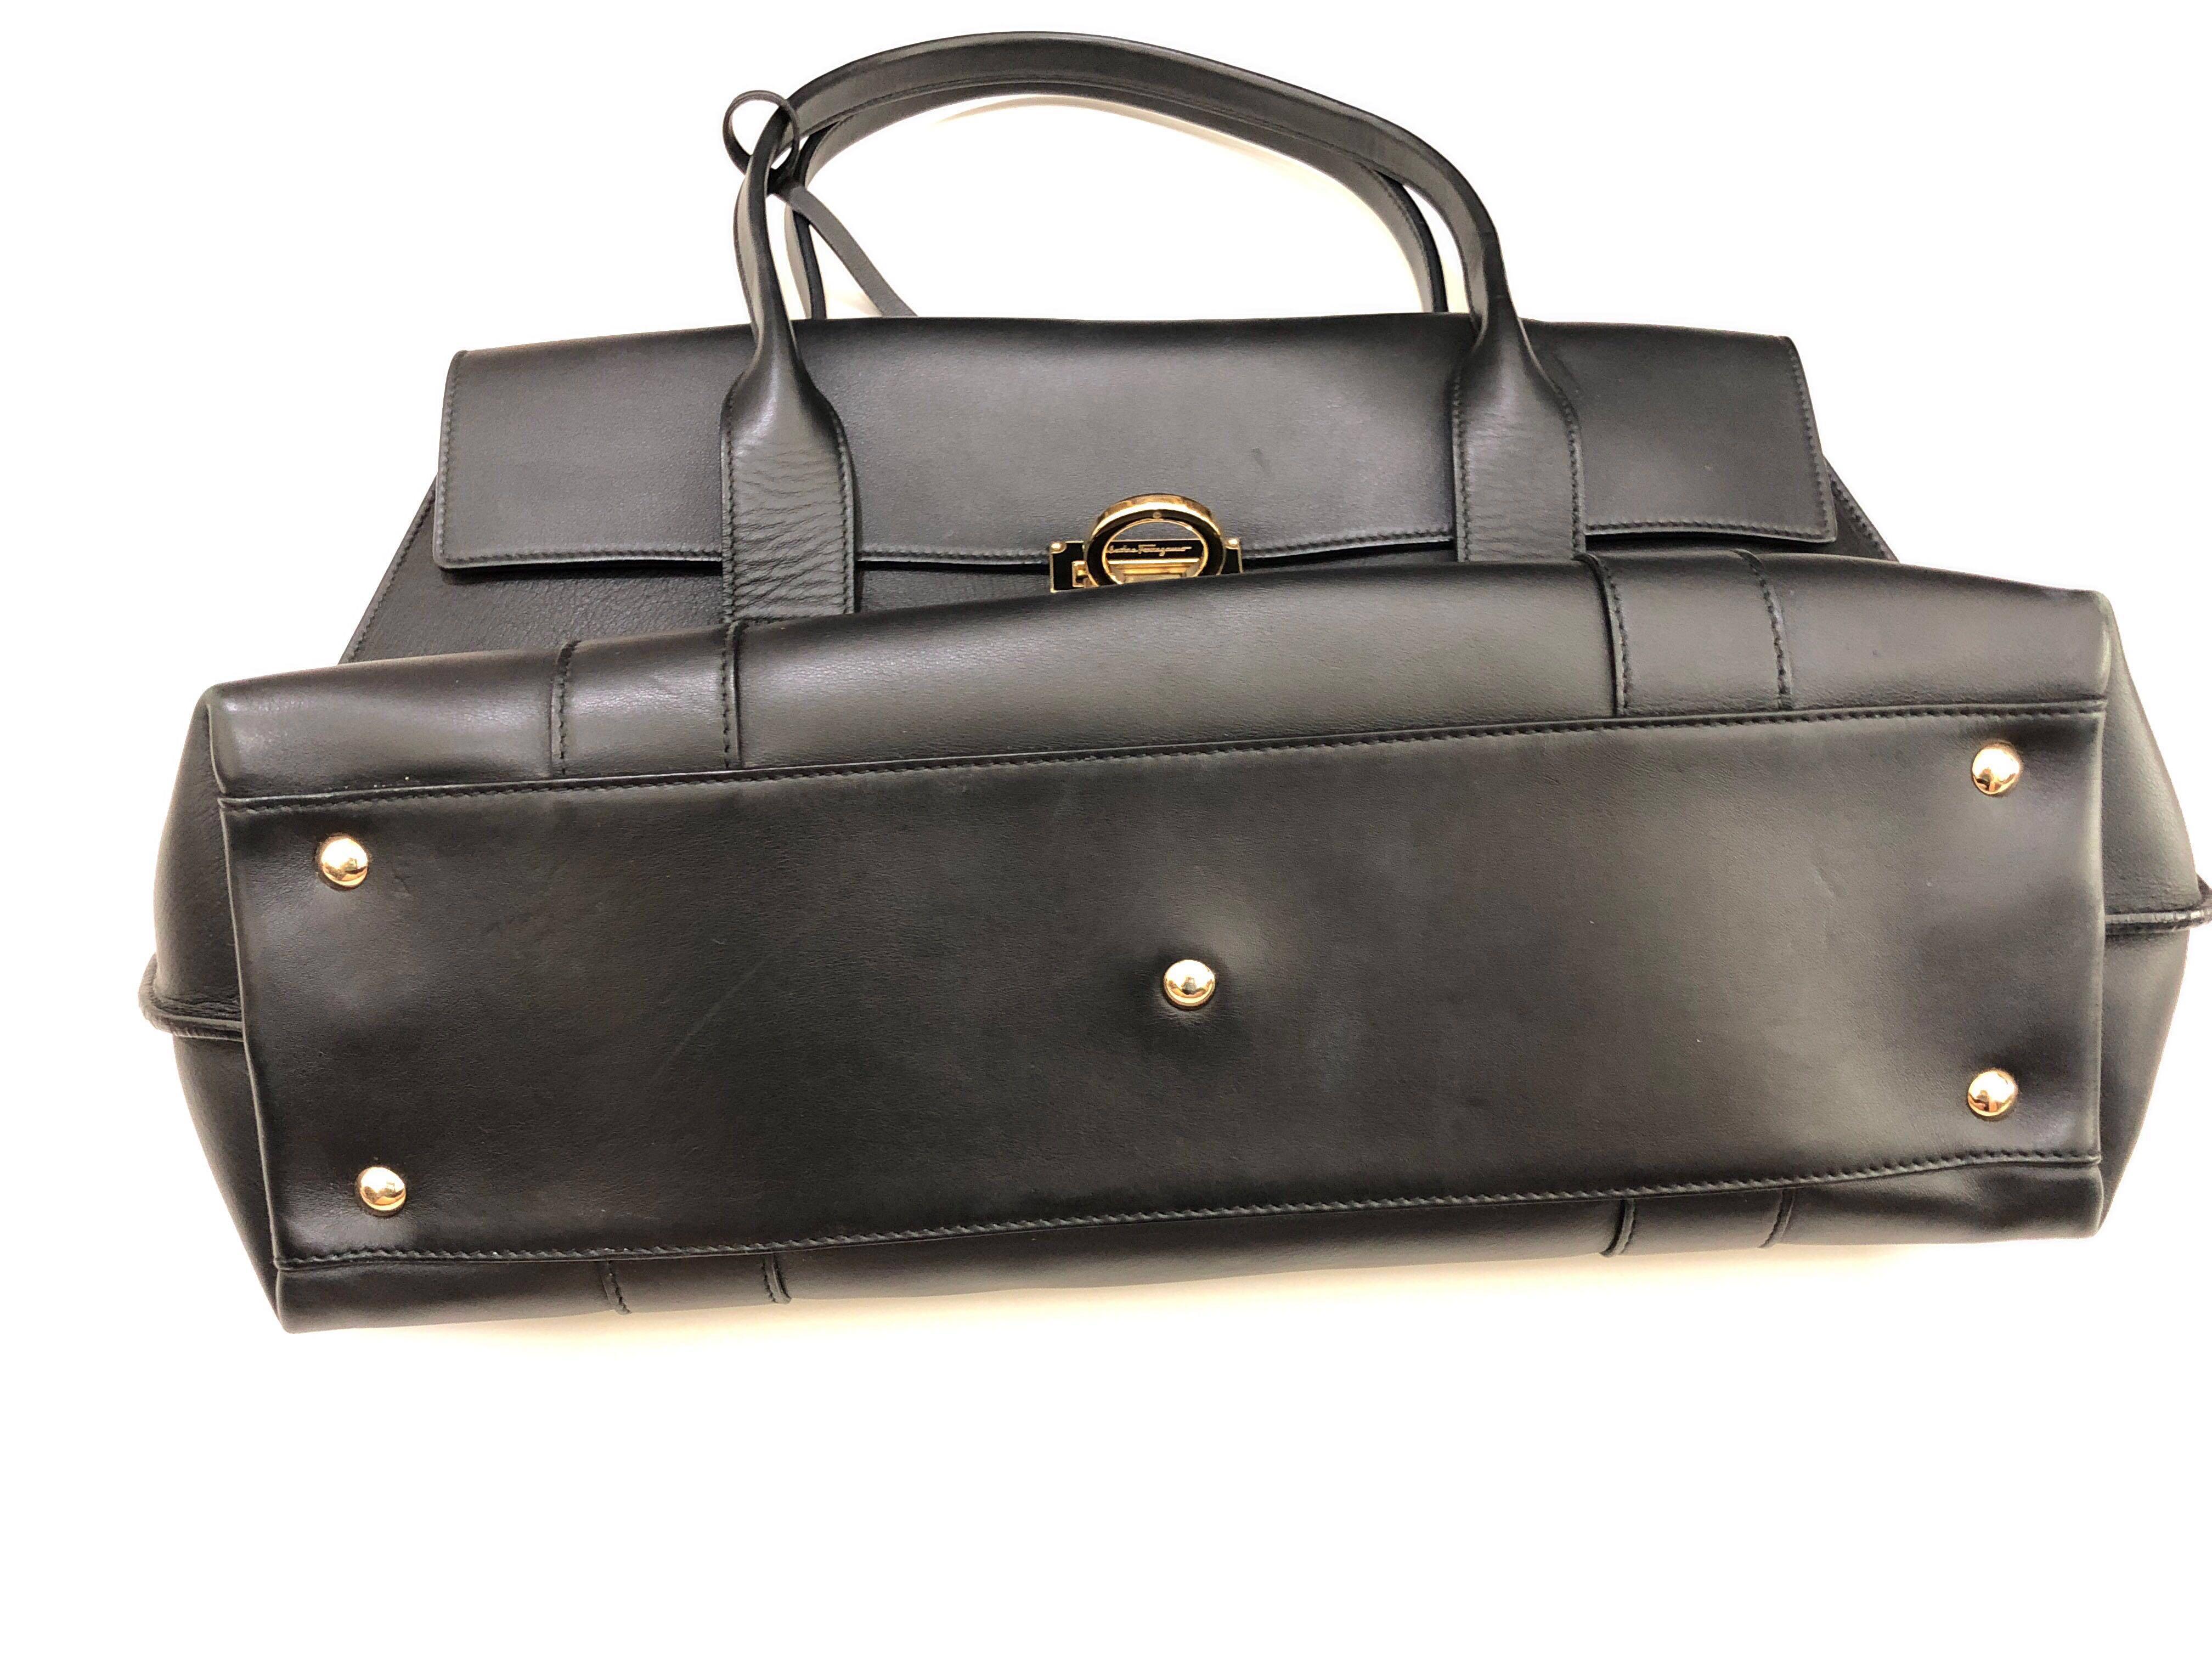 748bb44d7151 Full Leather Salvatore Ferragamo handbag